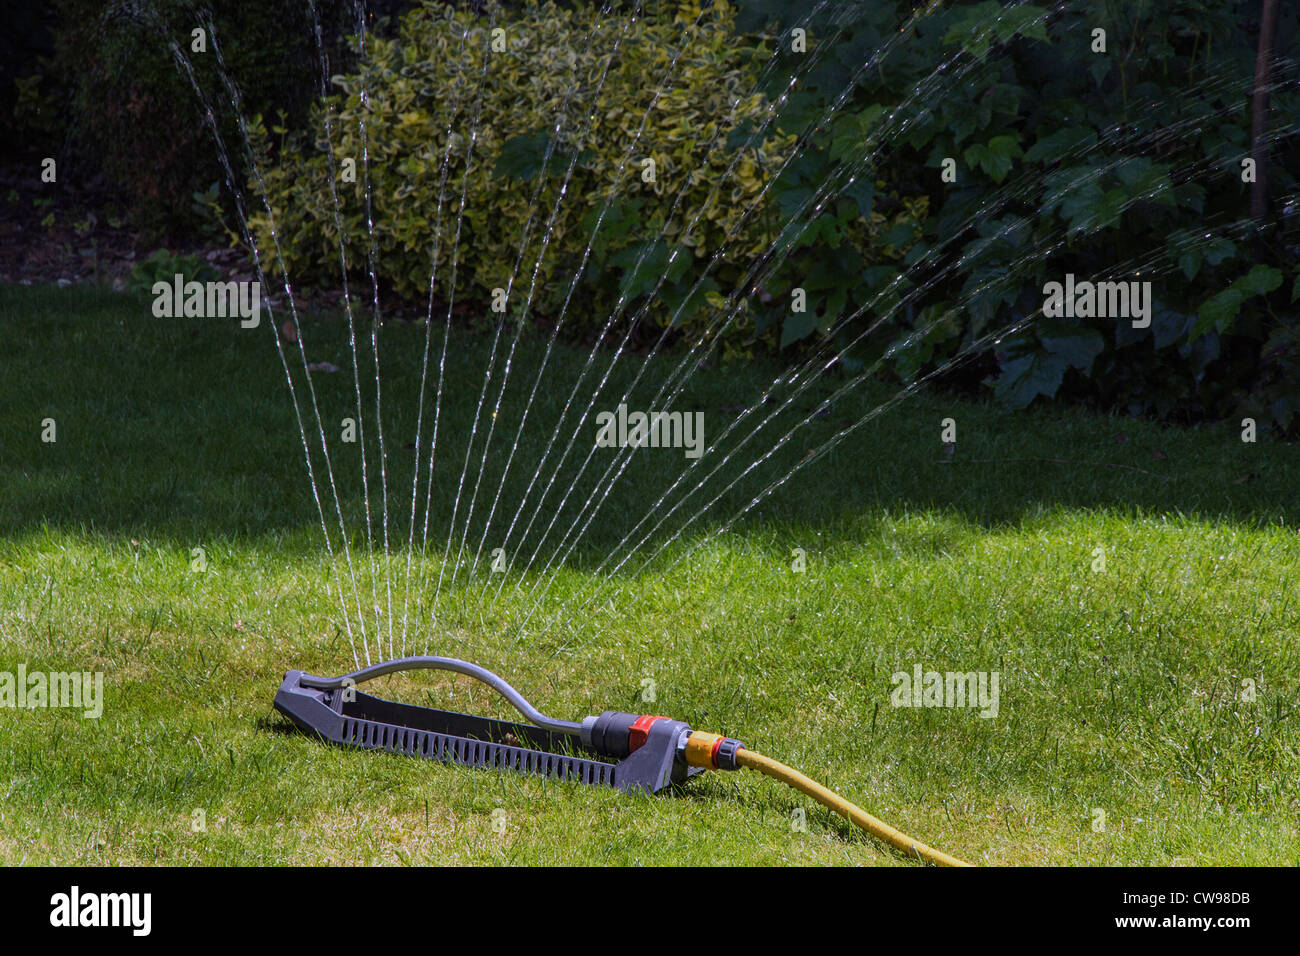 Garden Sprinkler watering lawn Stock Photo Royalty Free Image